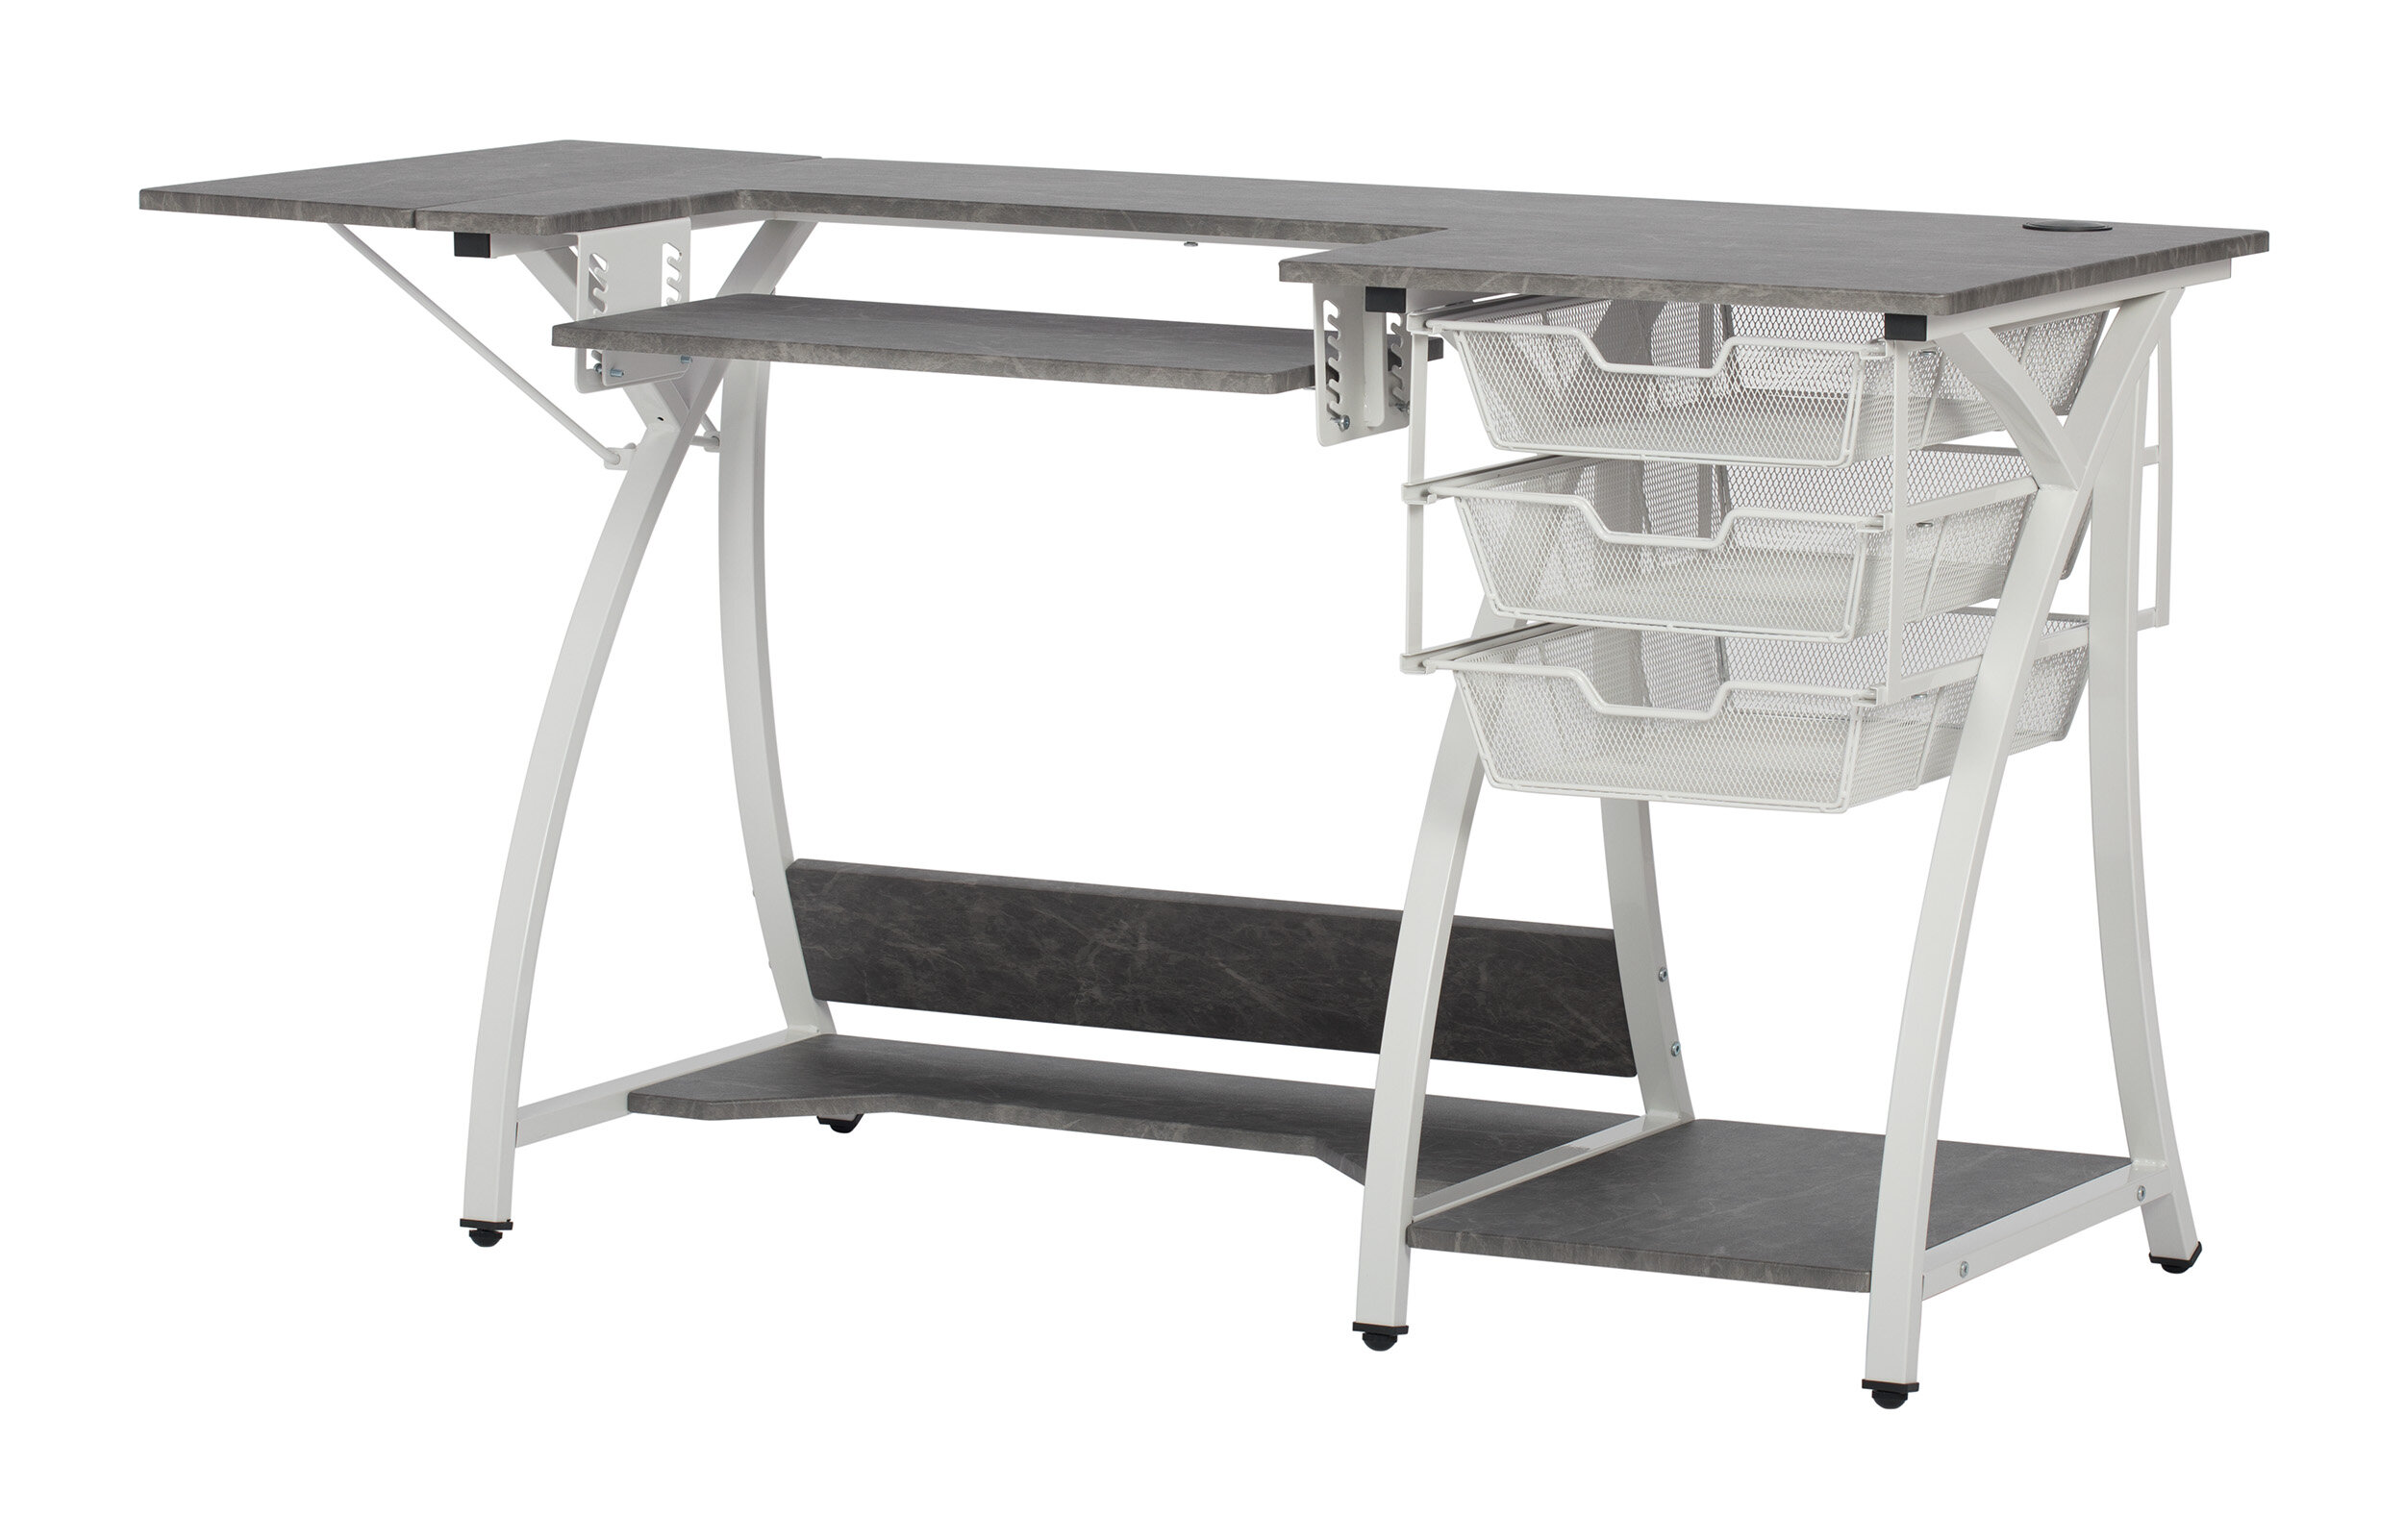 Table A Machine A Coudre table de couture pro-couture machine